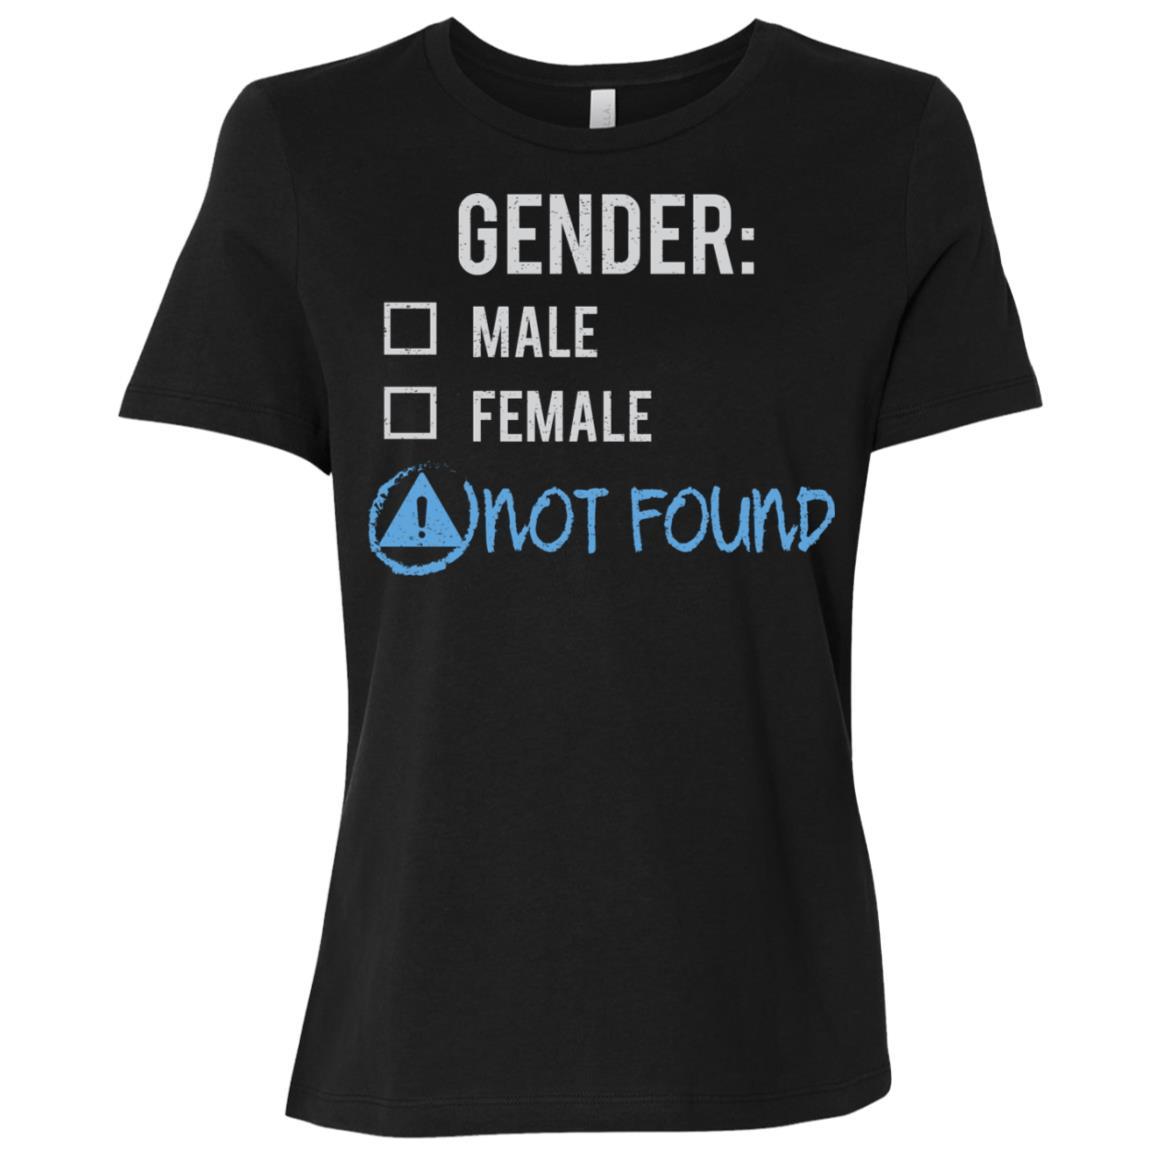 Male Female Not Found Gender Nonbinary Trans Women Short Sleeve T-Shirt